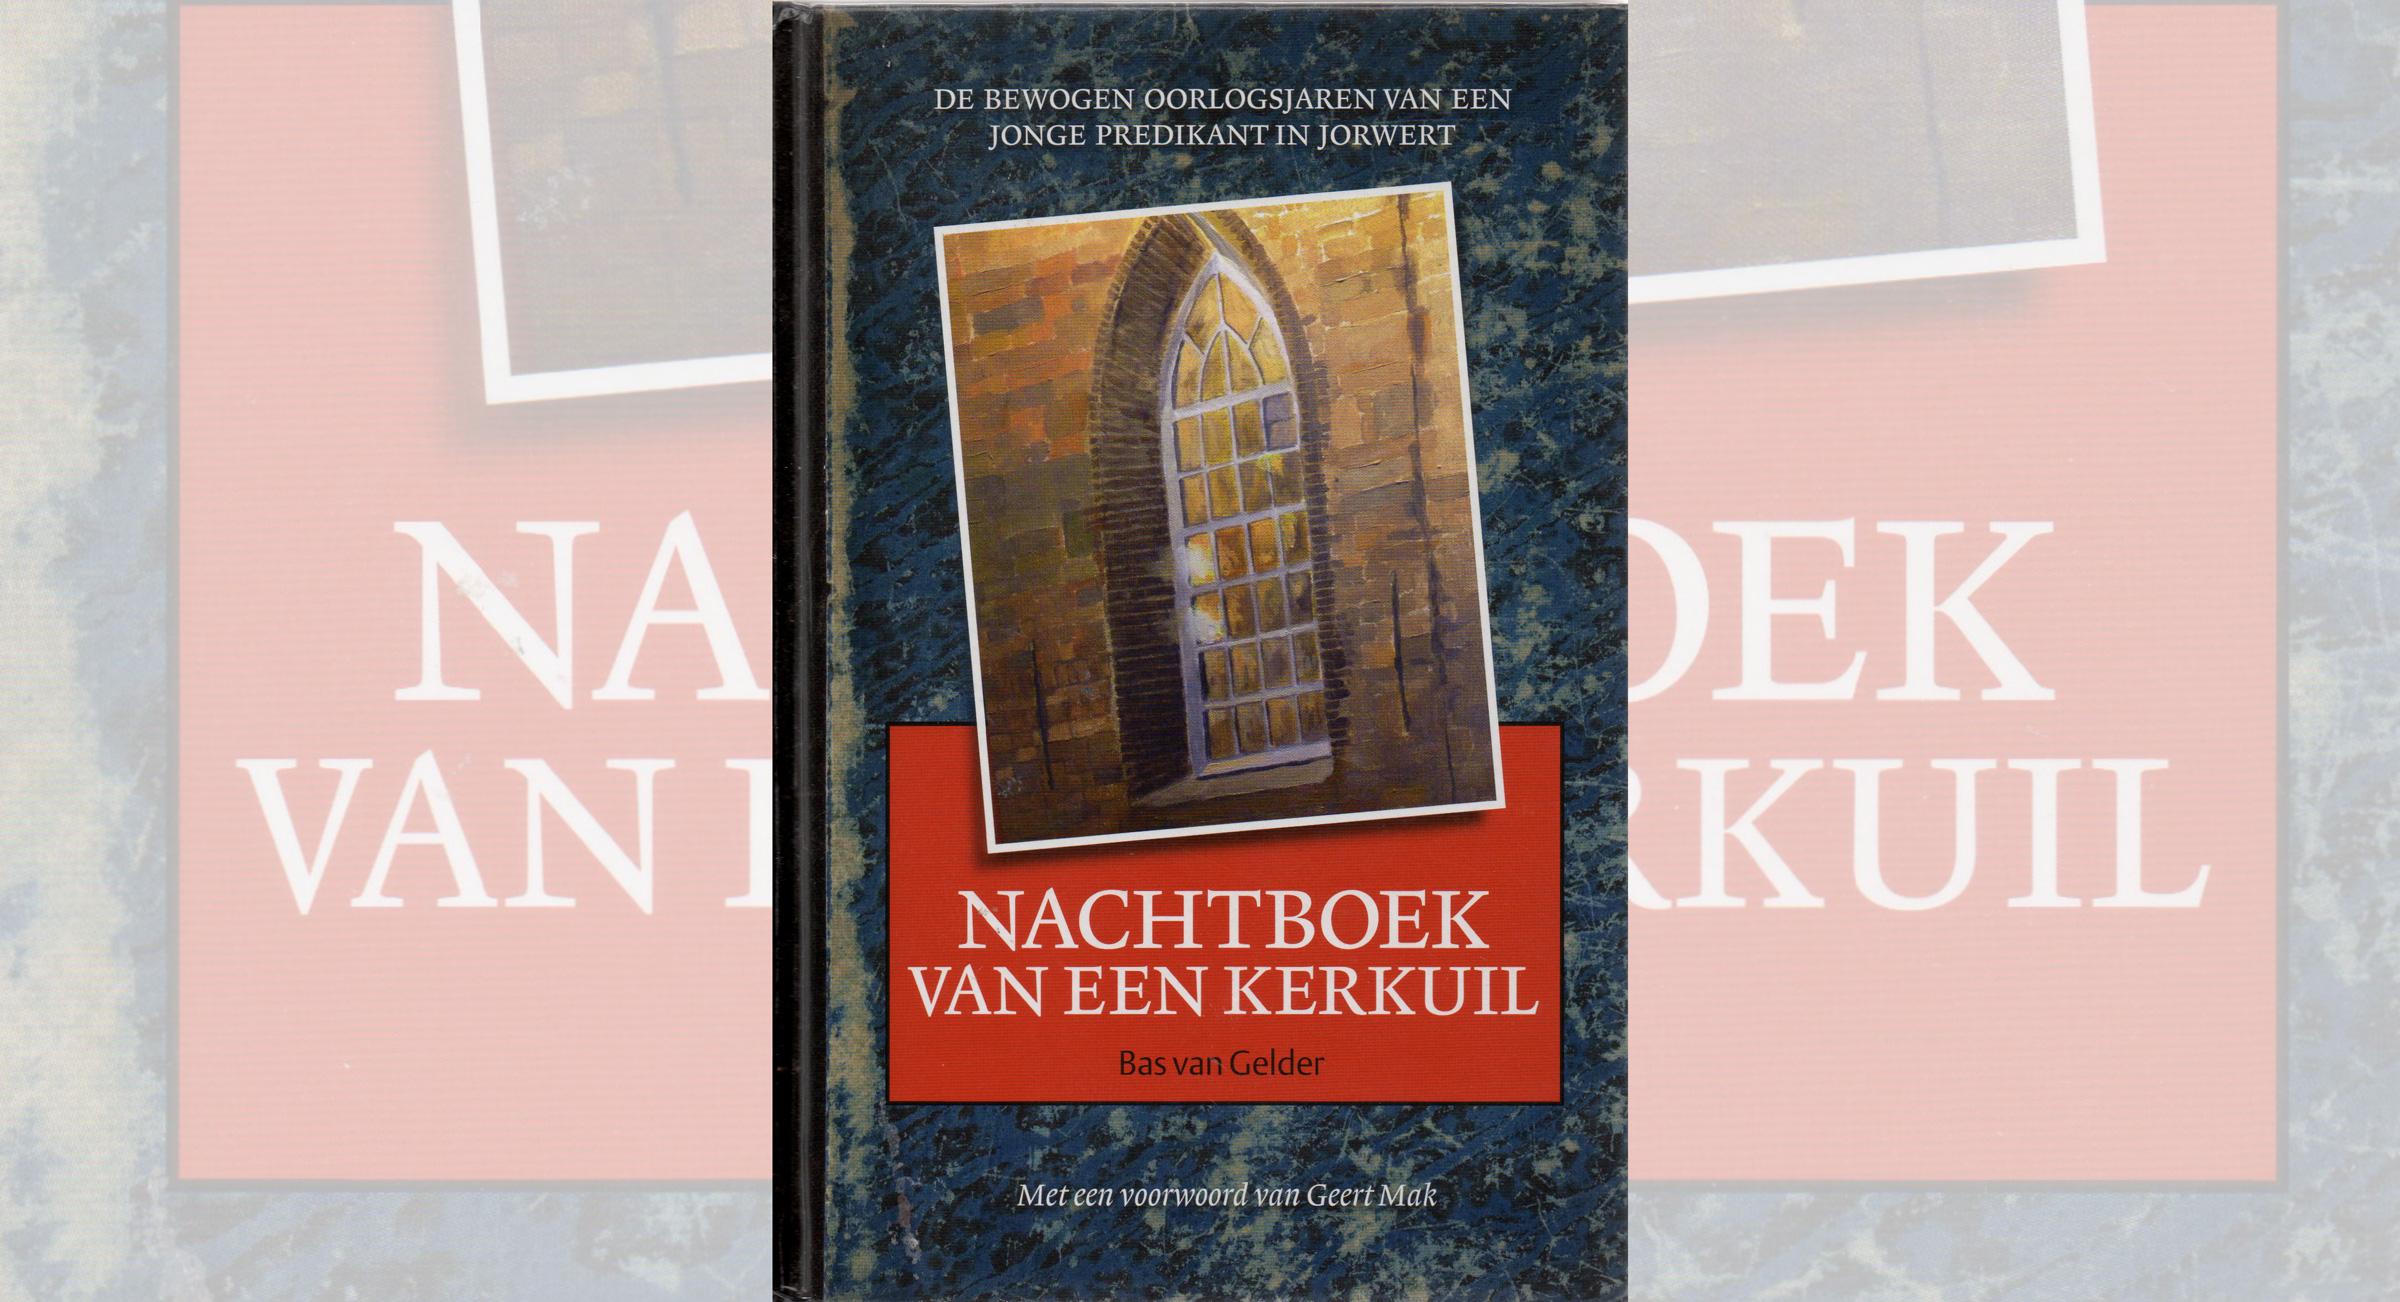 Jorwert-Omslag-boek-van-Gelder_kleiner